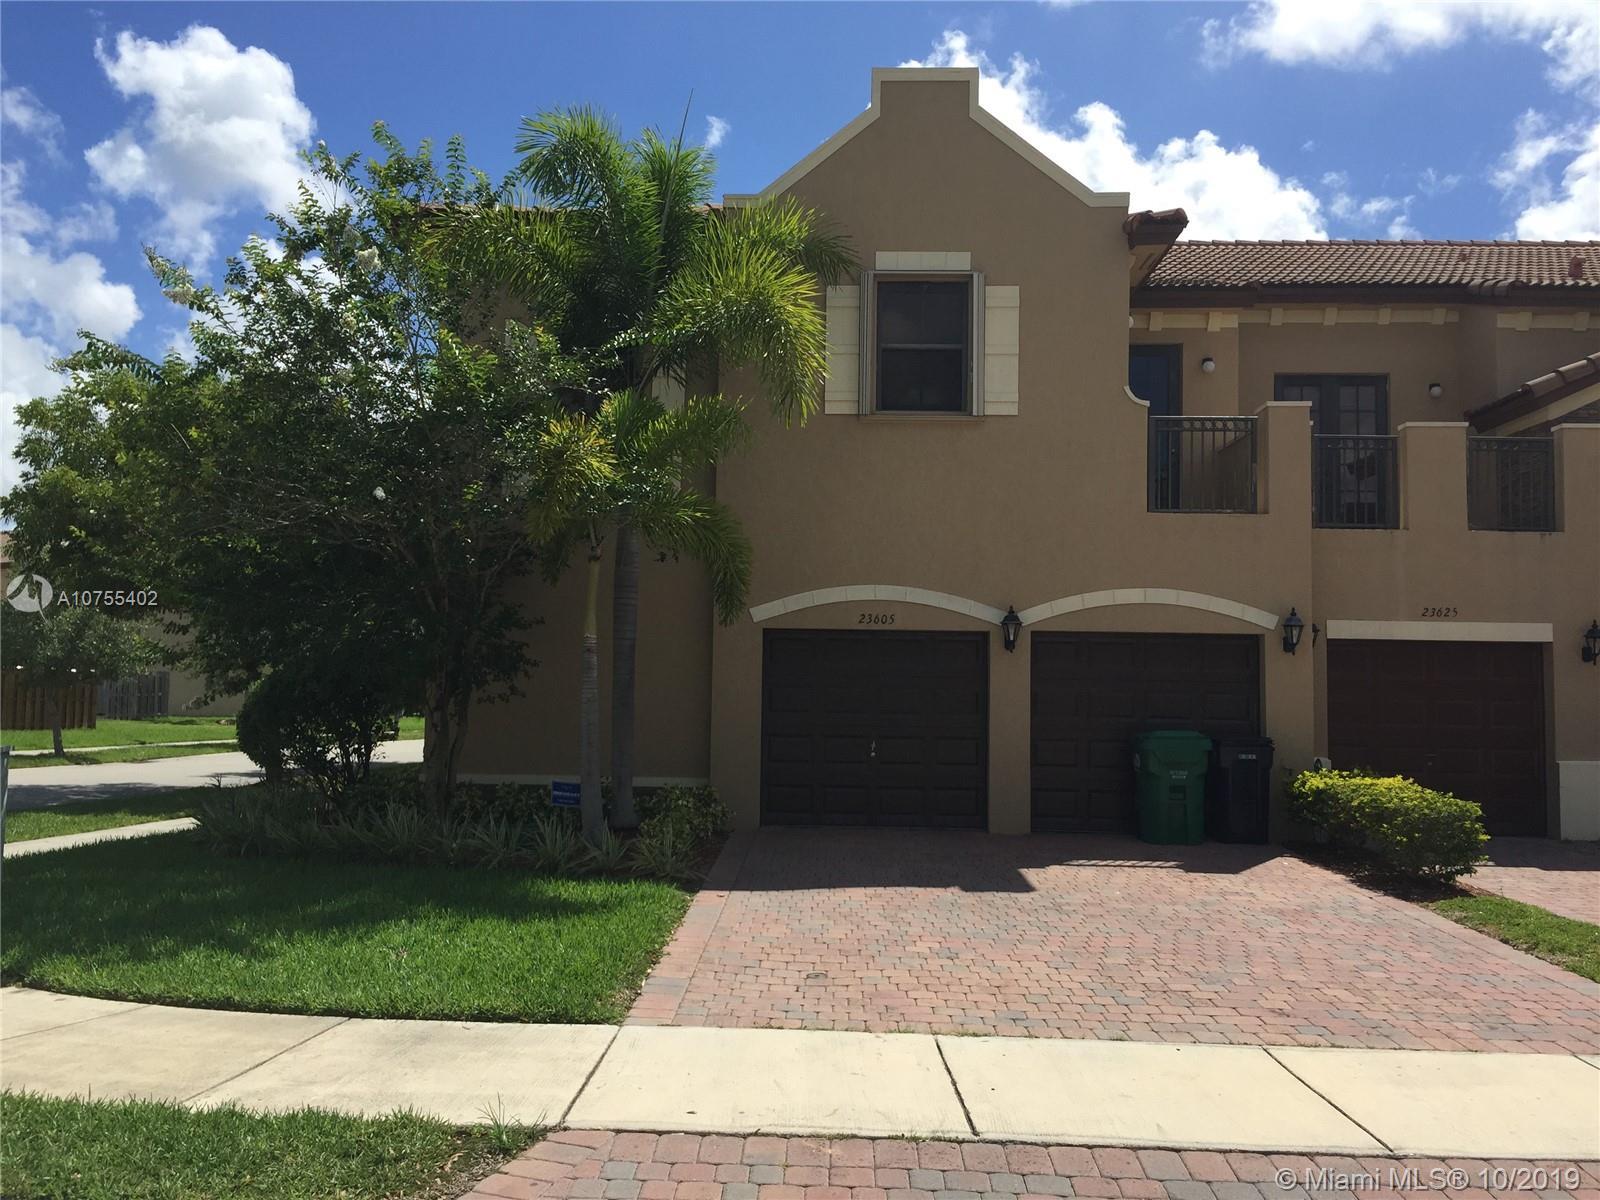 23605 SW 113th Pass, Homestead, FL 33032 - Homestead, FL real estate listing